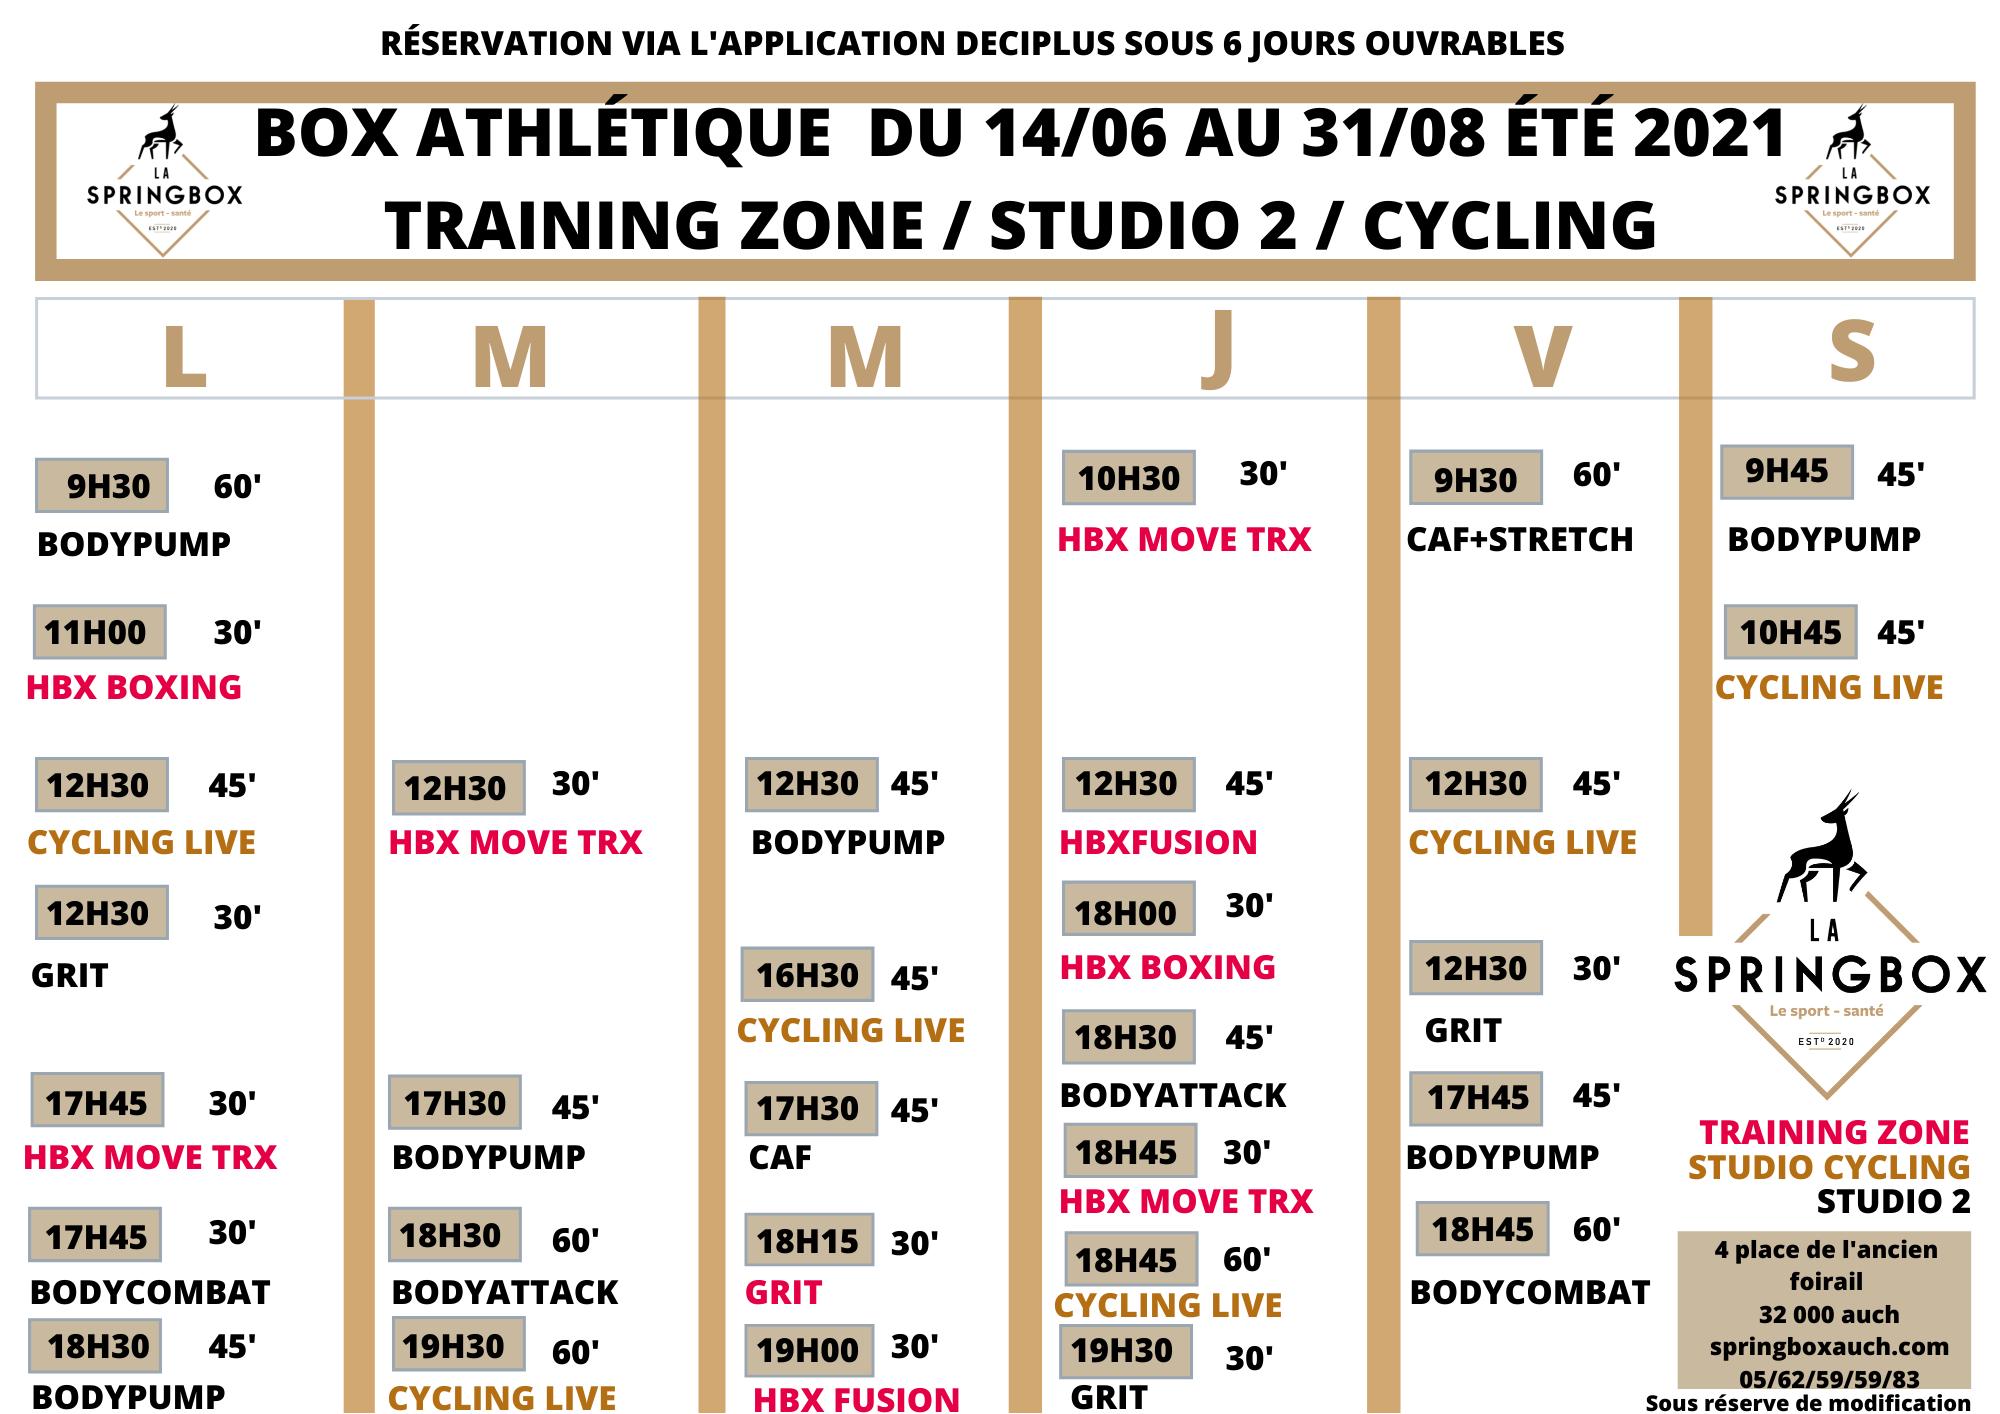 Springbox club sport musculation auch Planning